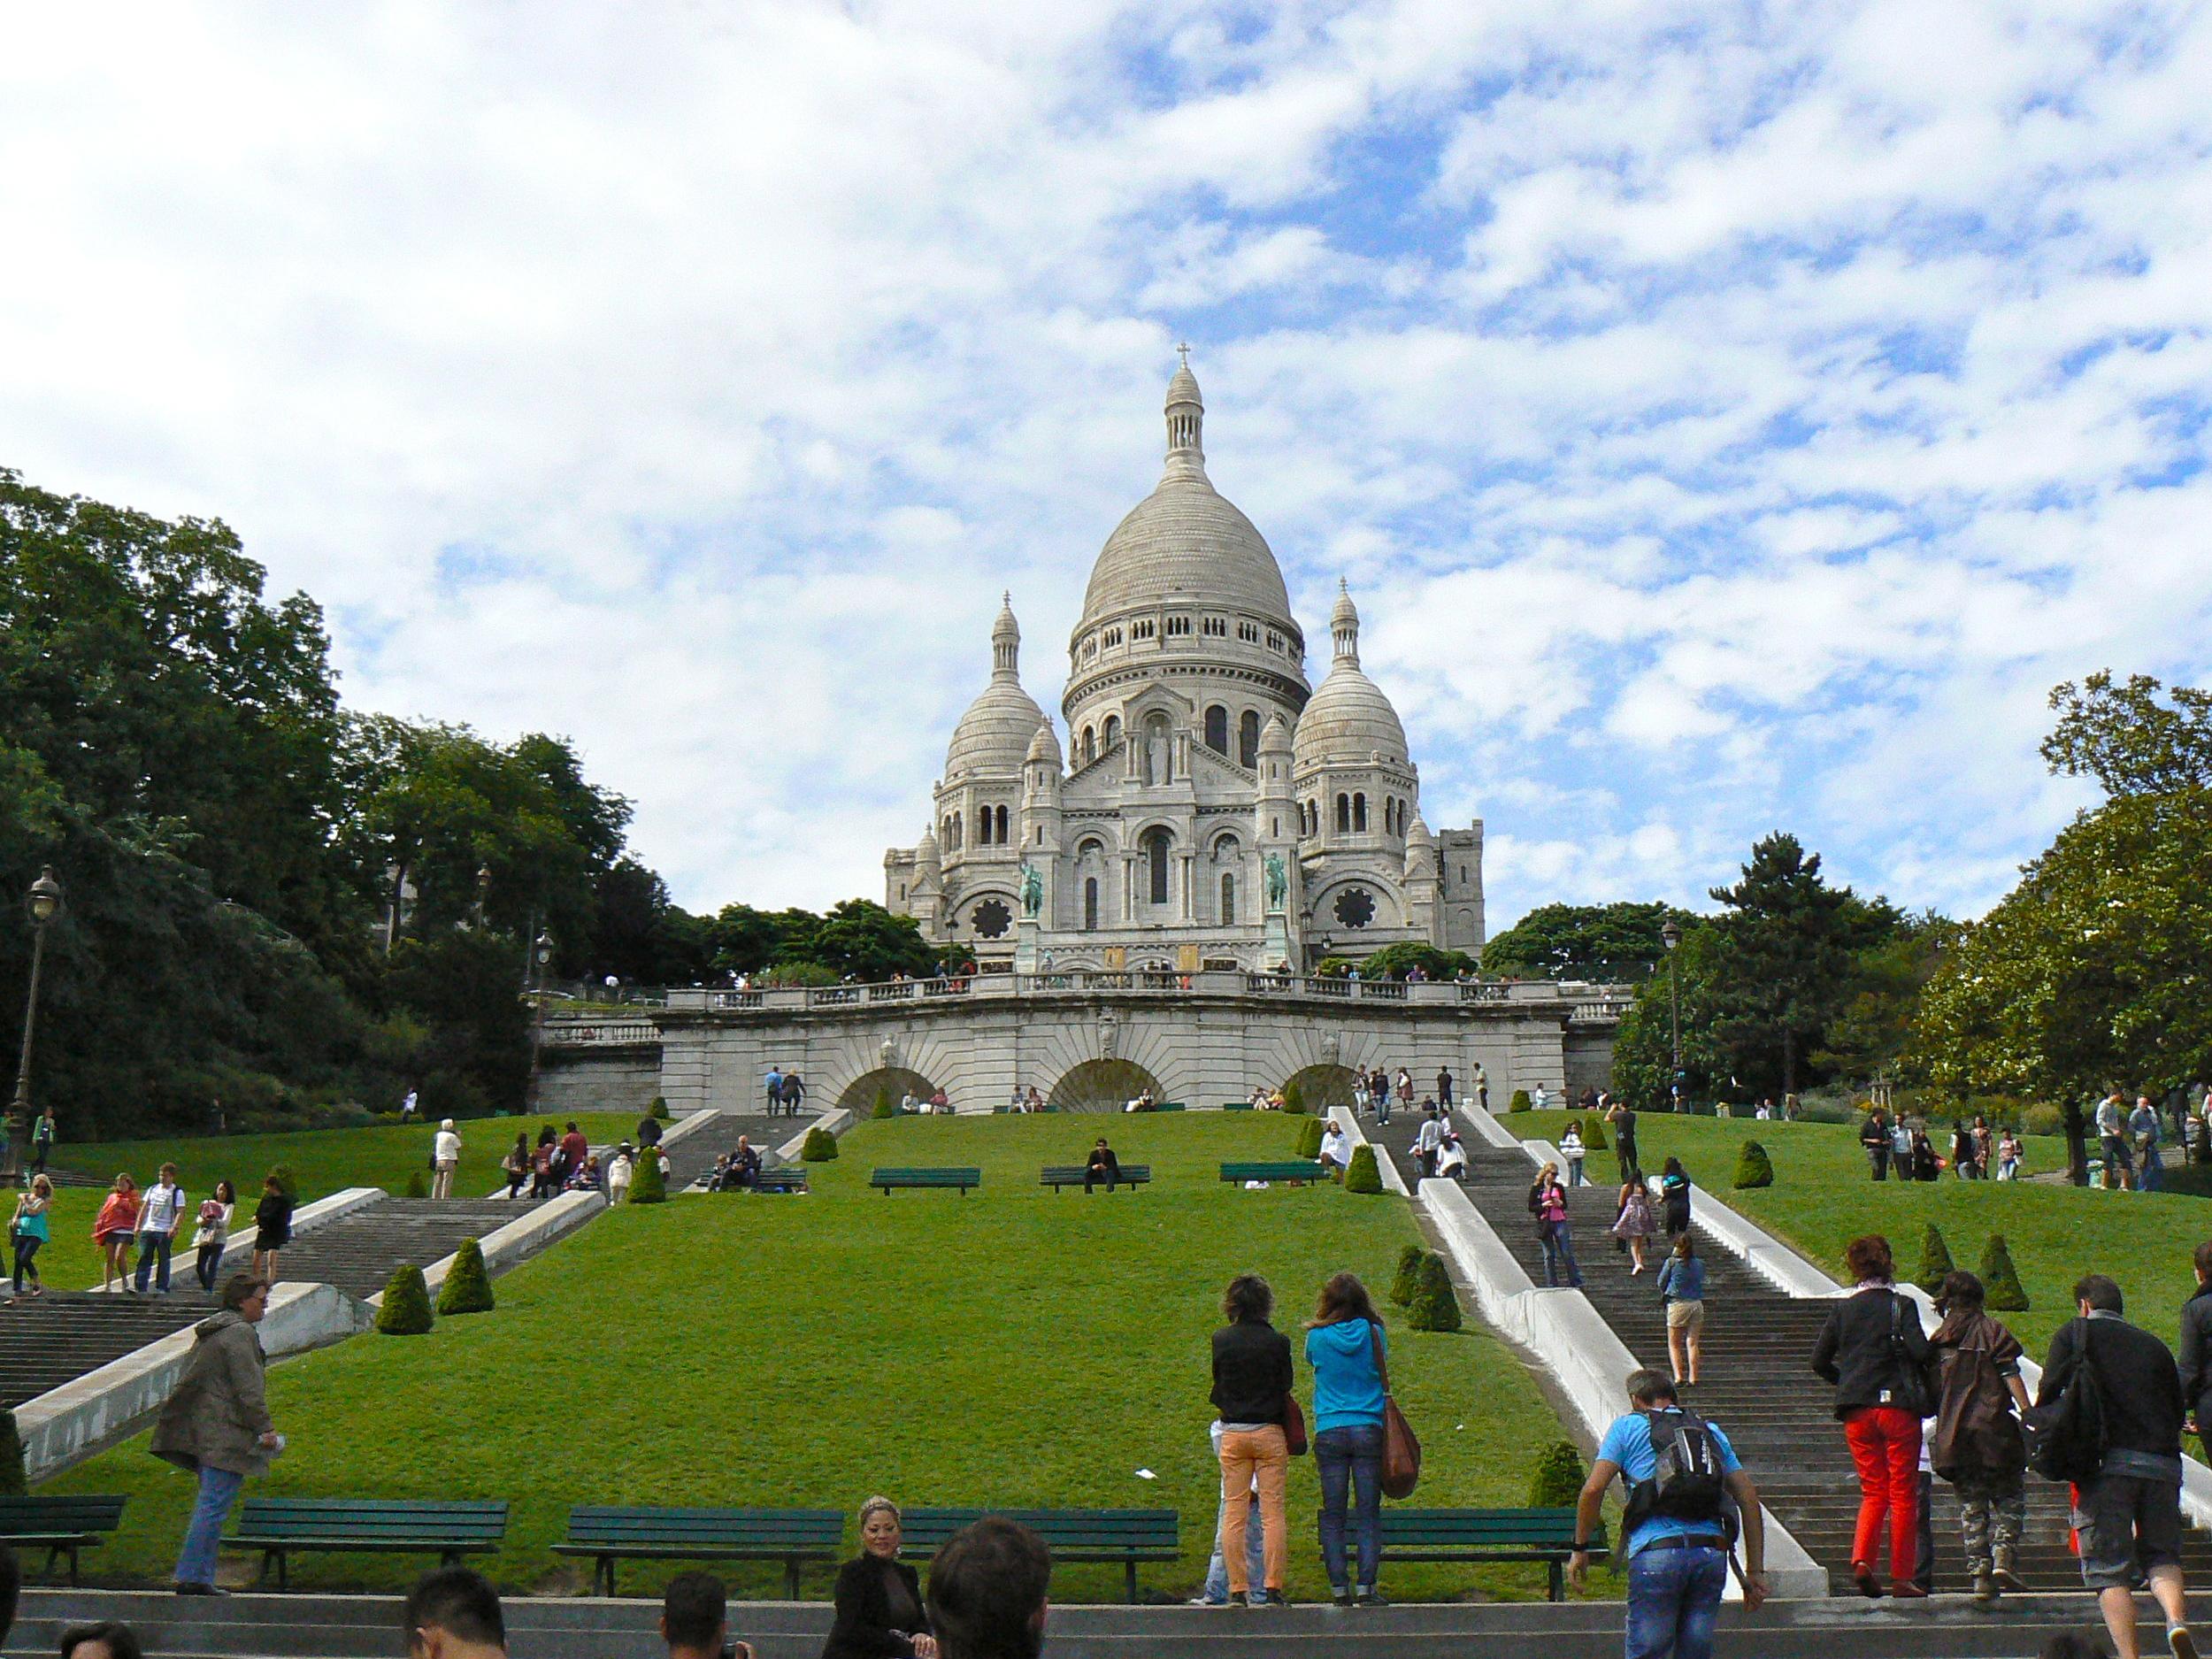 Basilique of the Sacré-Coeur